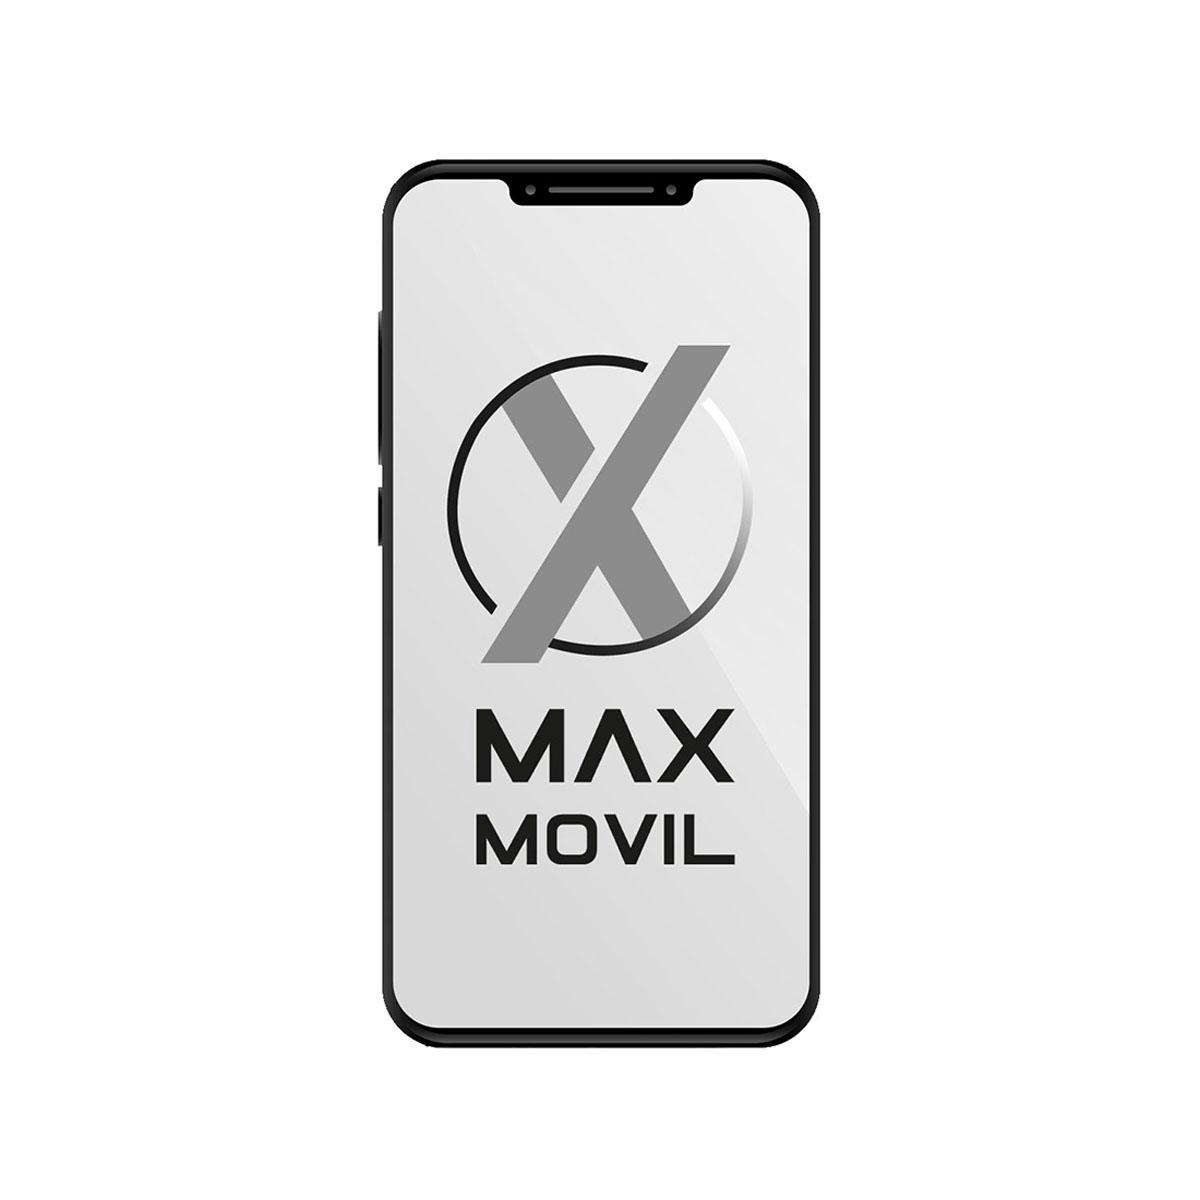 Tablet LG G Pad v490 8.0 blanco 4G